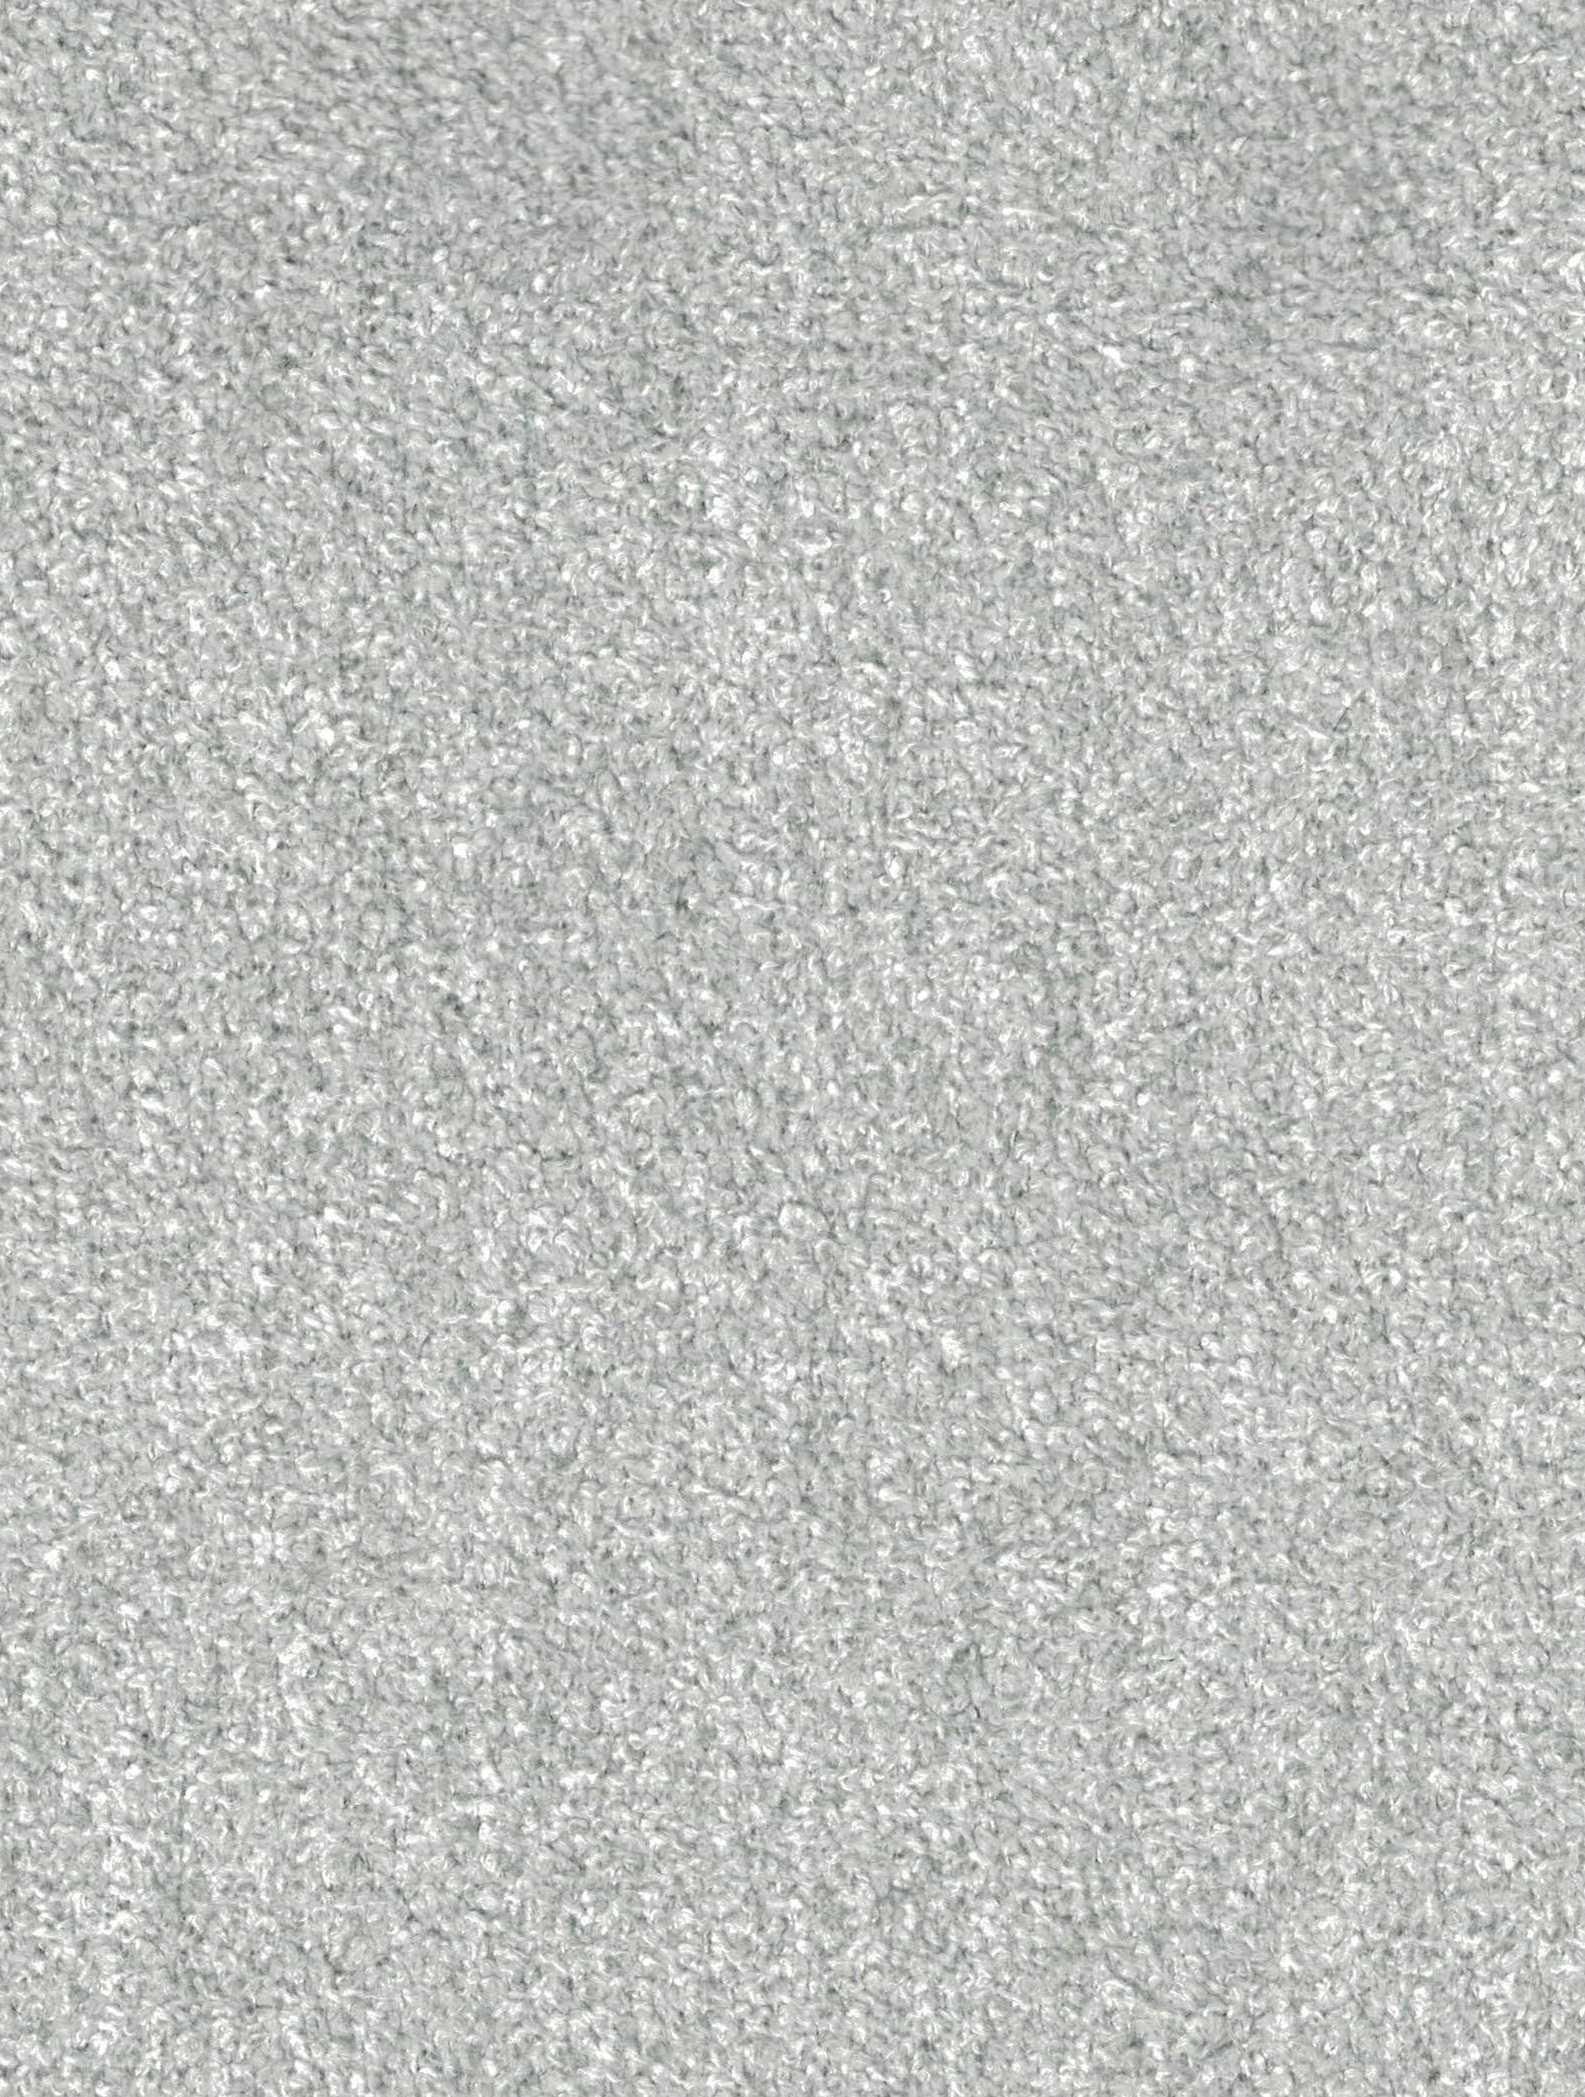 serta 11 lt.grey